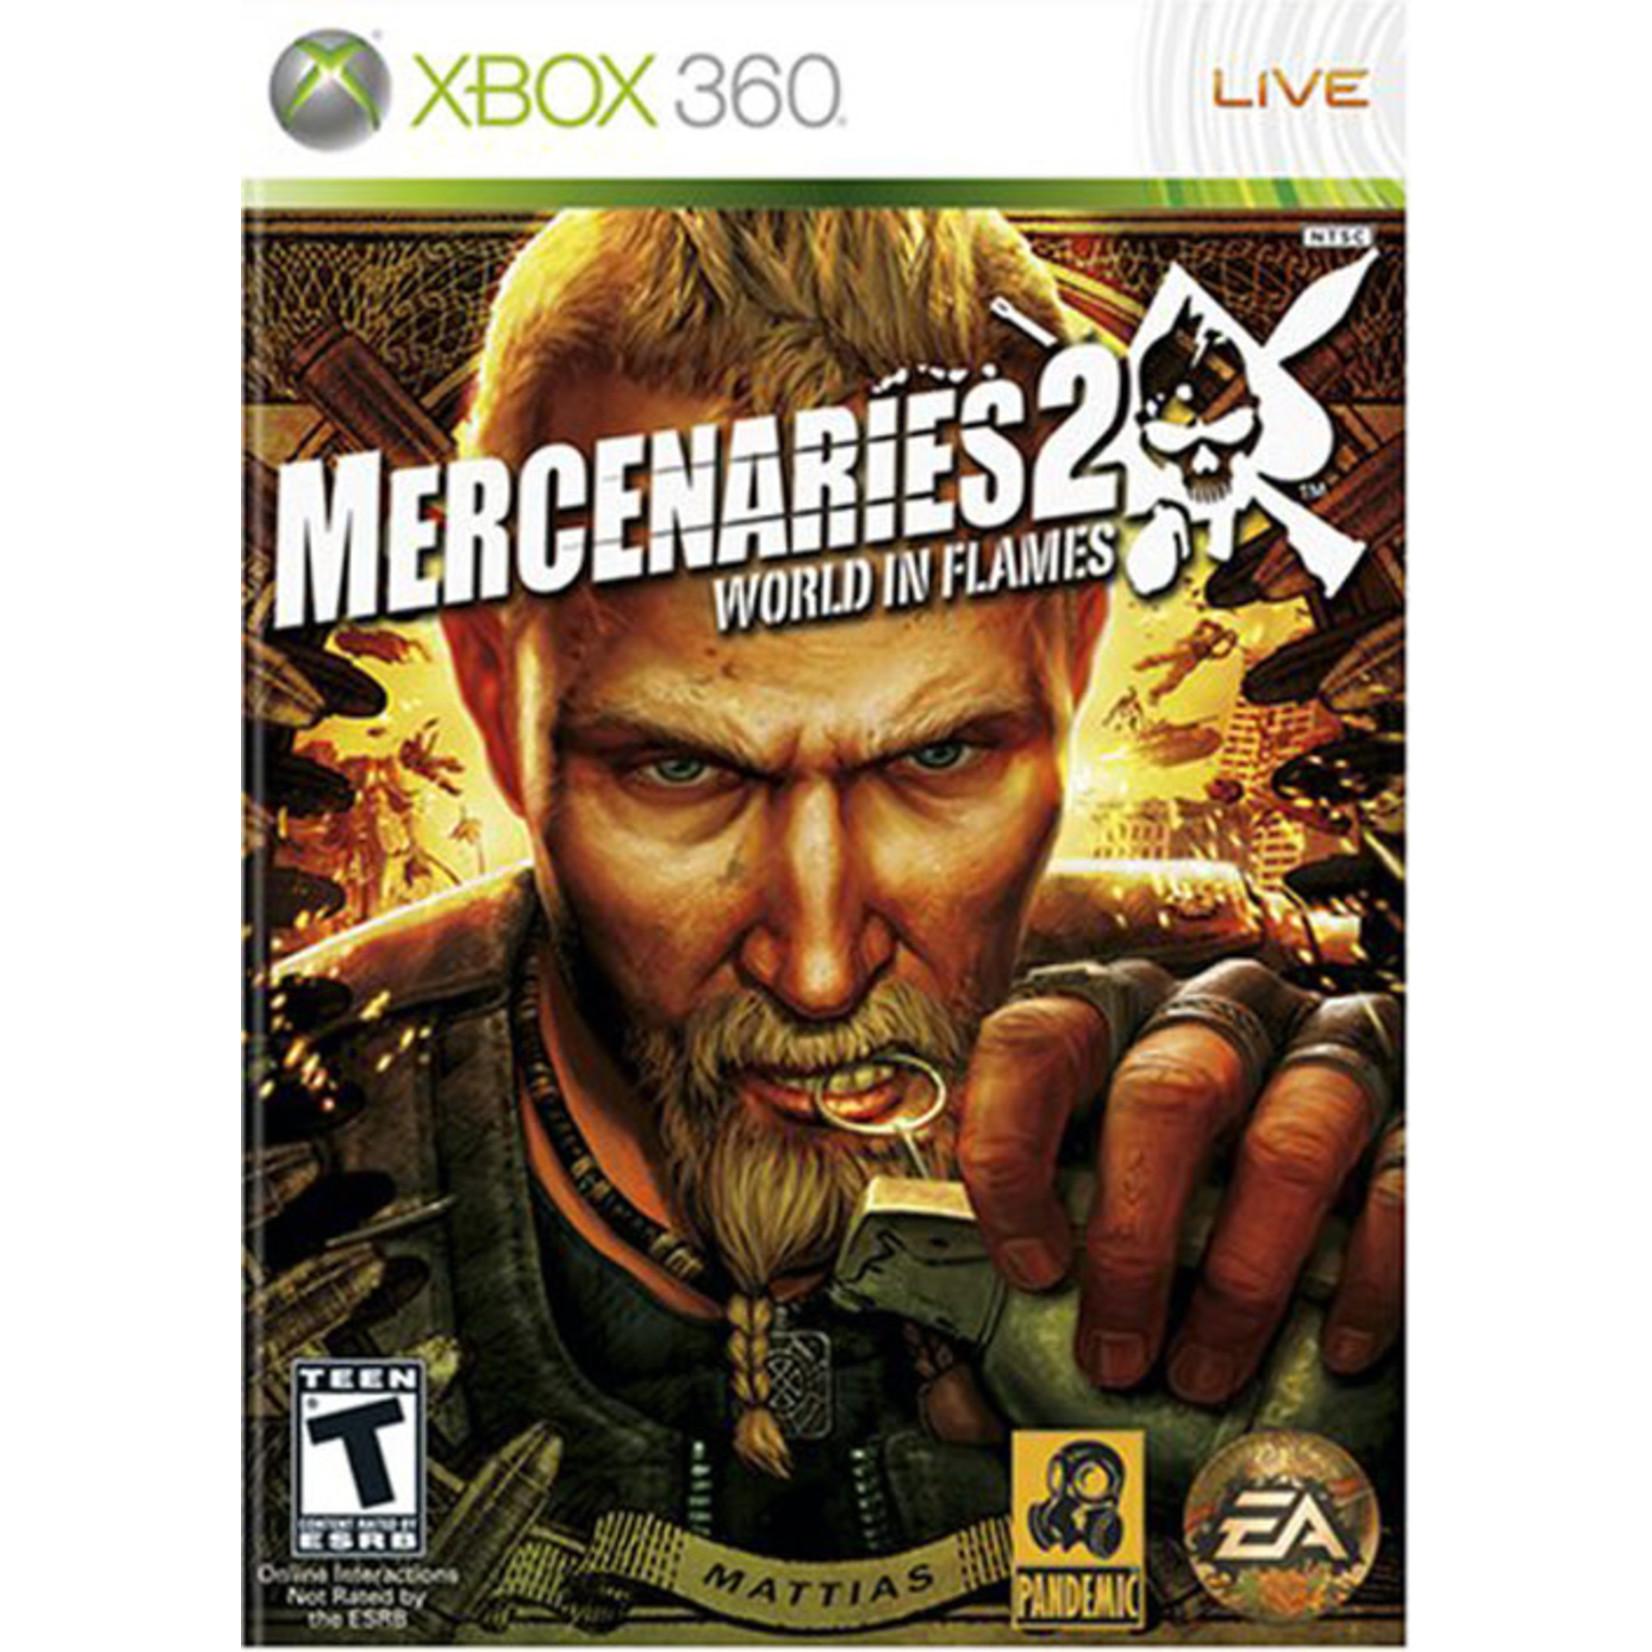 X3U-MERCENARIES 2: WORLD IN FLAMES